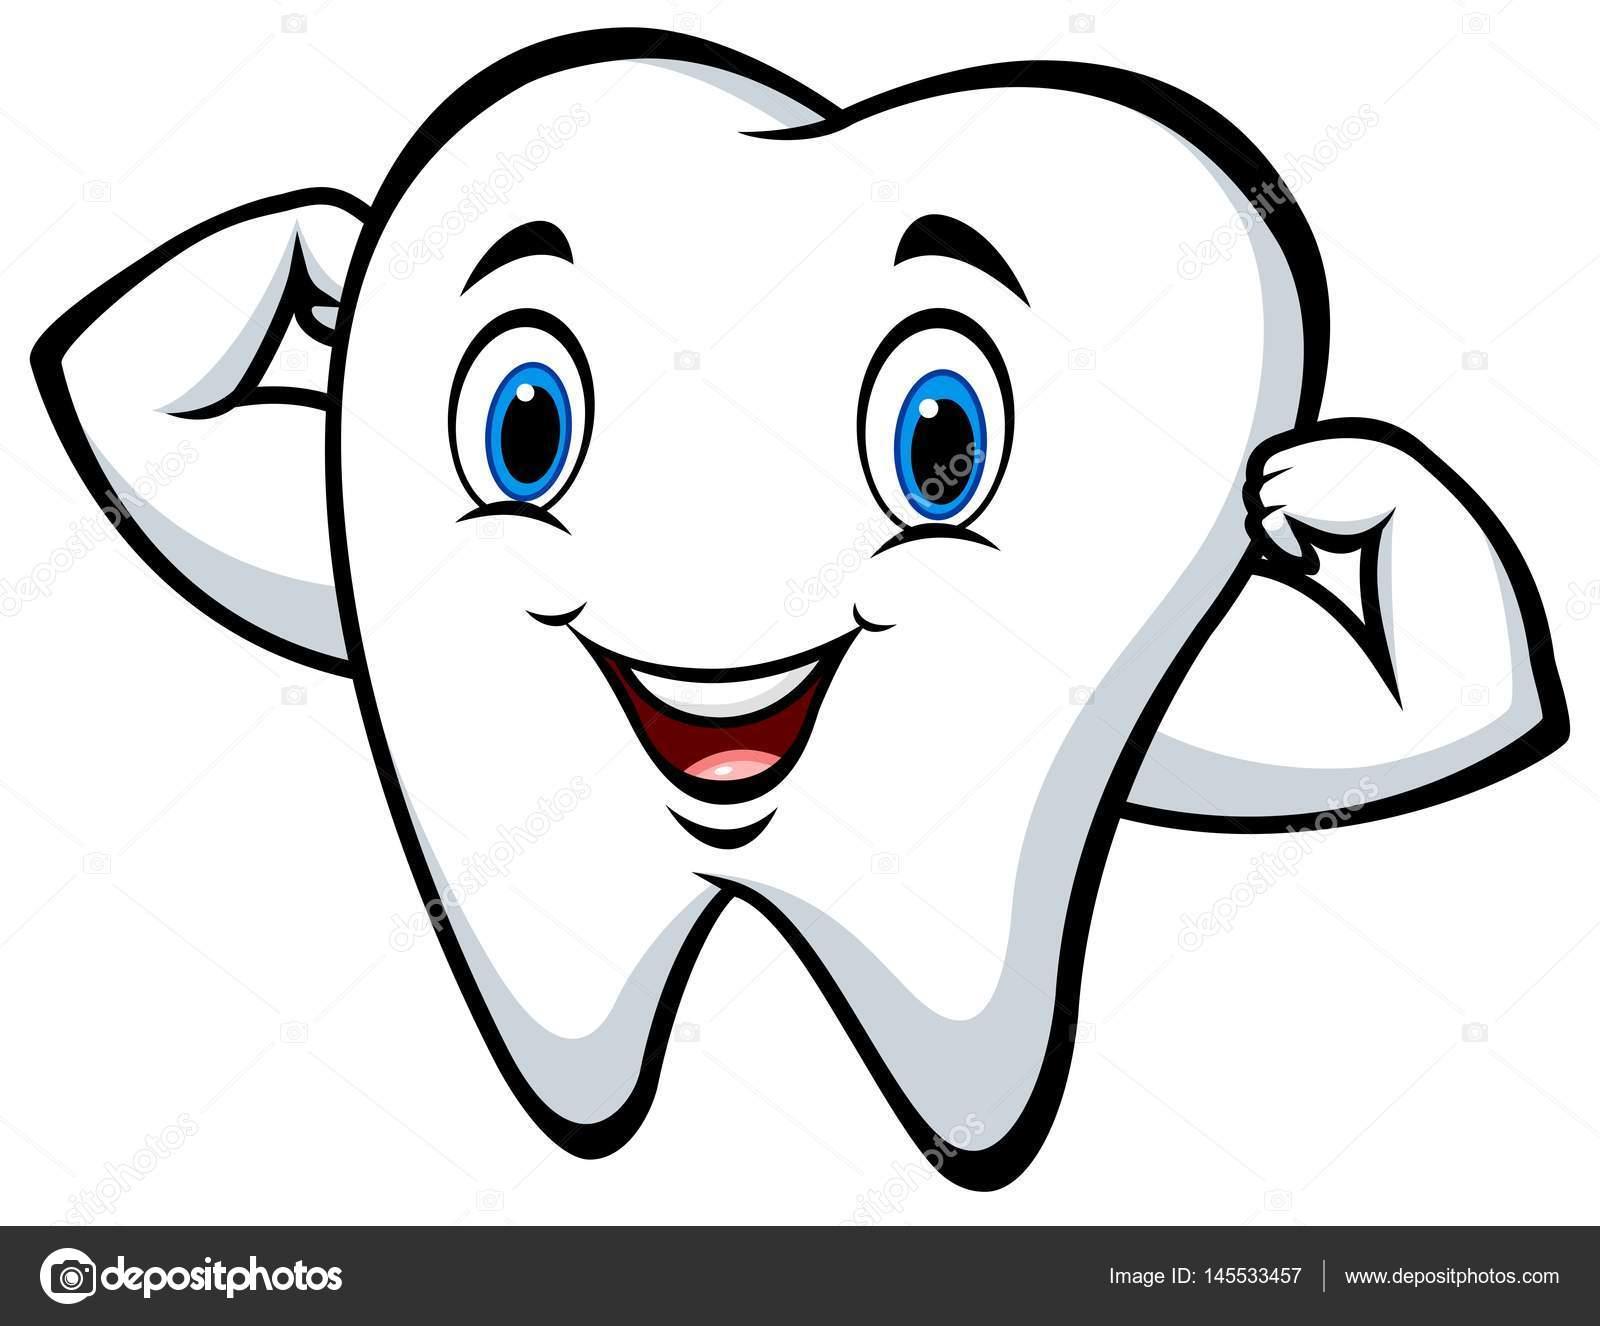 Stock Illustration Cartoon Strong Tooth Character also Unlu Ressamlarin Kolay Yagli Boya Tablolari T111847 0 furthermore How To Best Avoid Kill Germs additionally E5 BA 93 E5 AD 98 E5 9B BE E7 89 87  E5 89 91 E9 BD BF E8 99 8E E8 A1 A8 E9 9D A2 Image26934014 also Diabetes Oral Health. on cartoon teeth